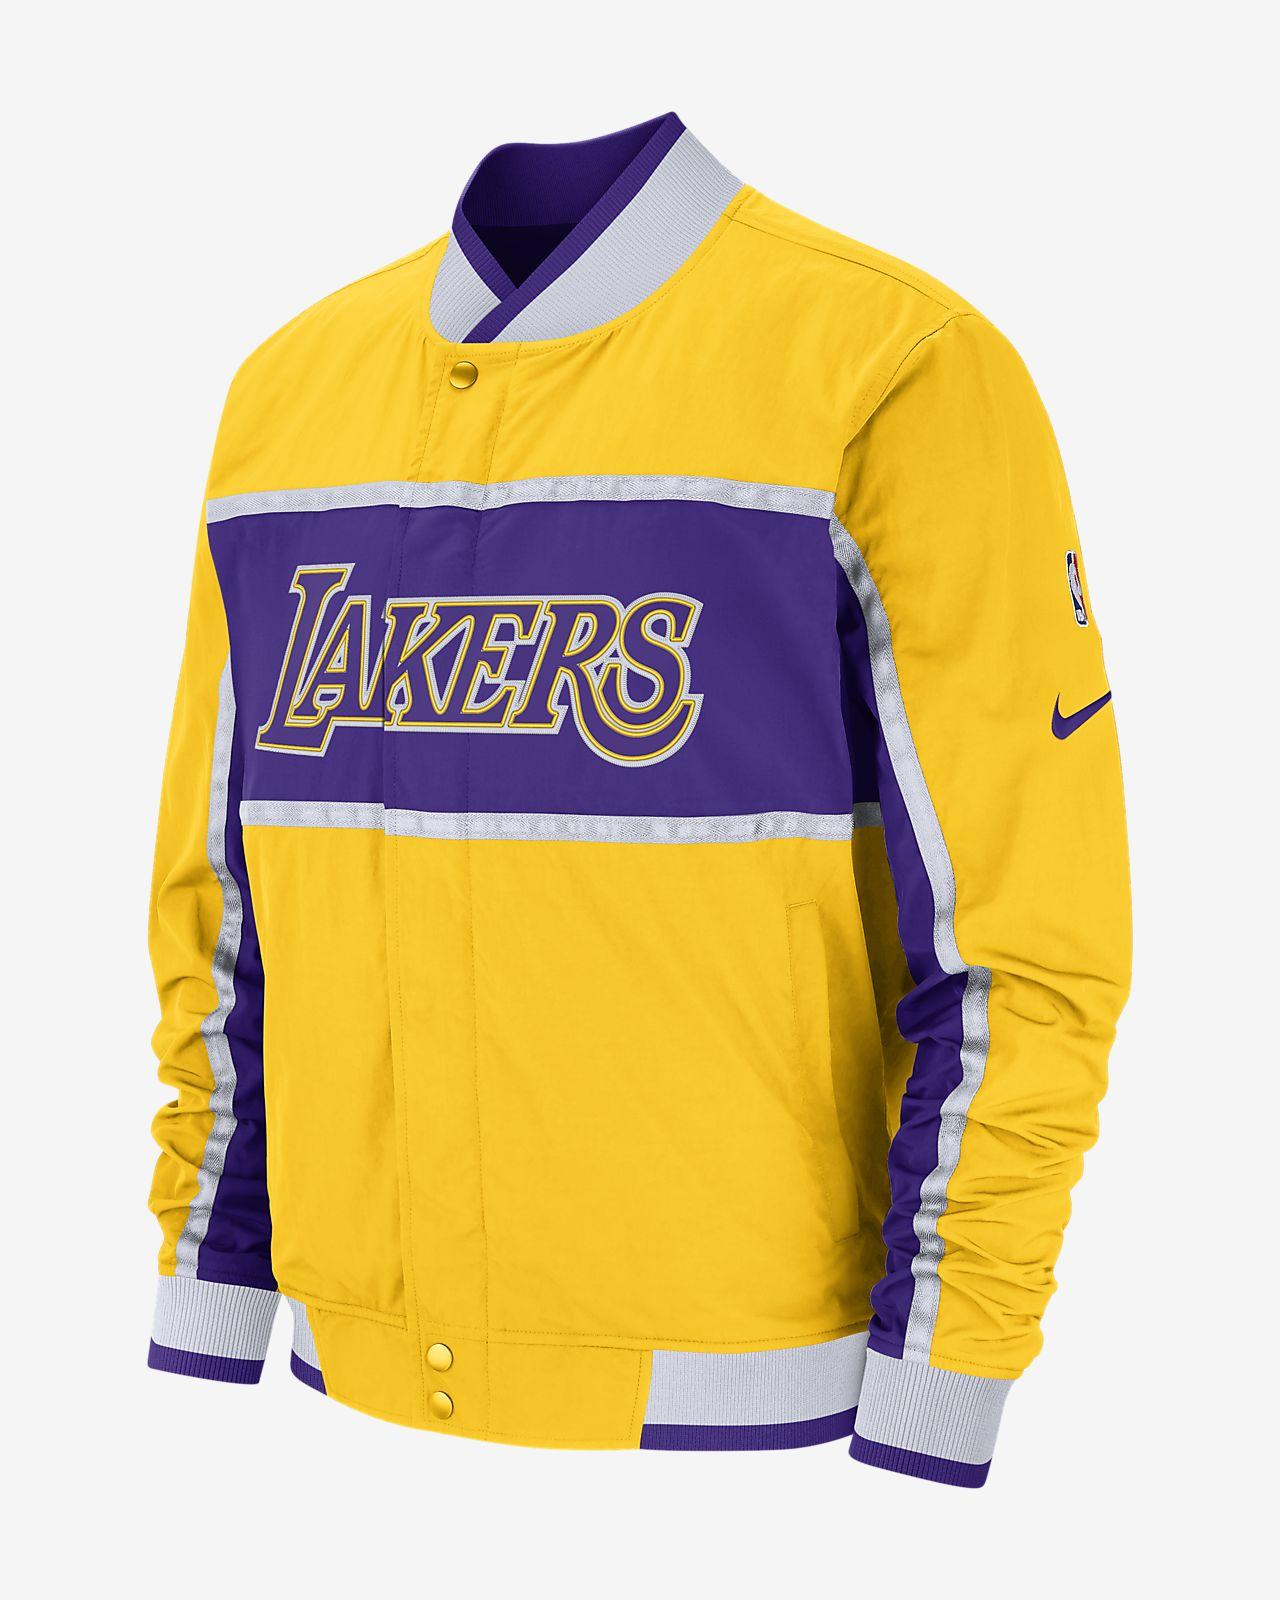 db4ce025514 Los Angeles Lakers Nike Courtside Men s NBA Jacket. Nike.com GB